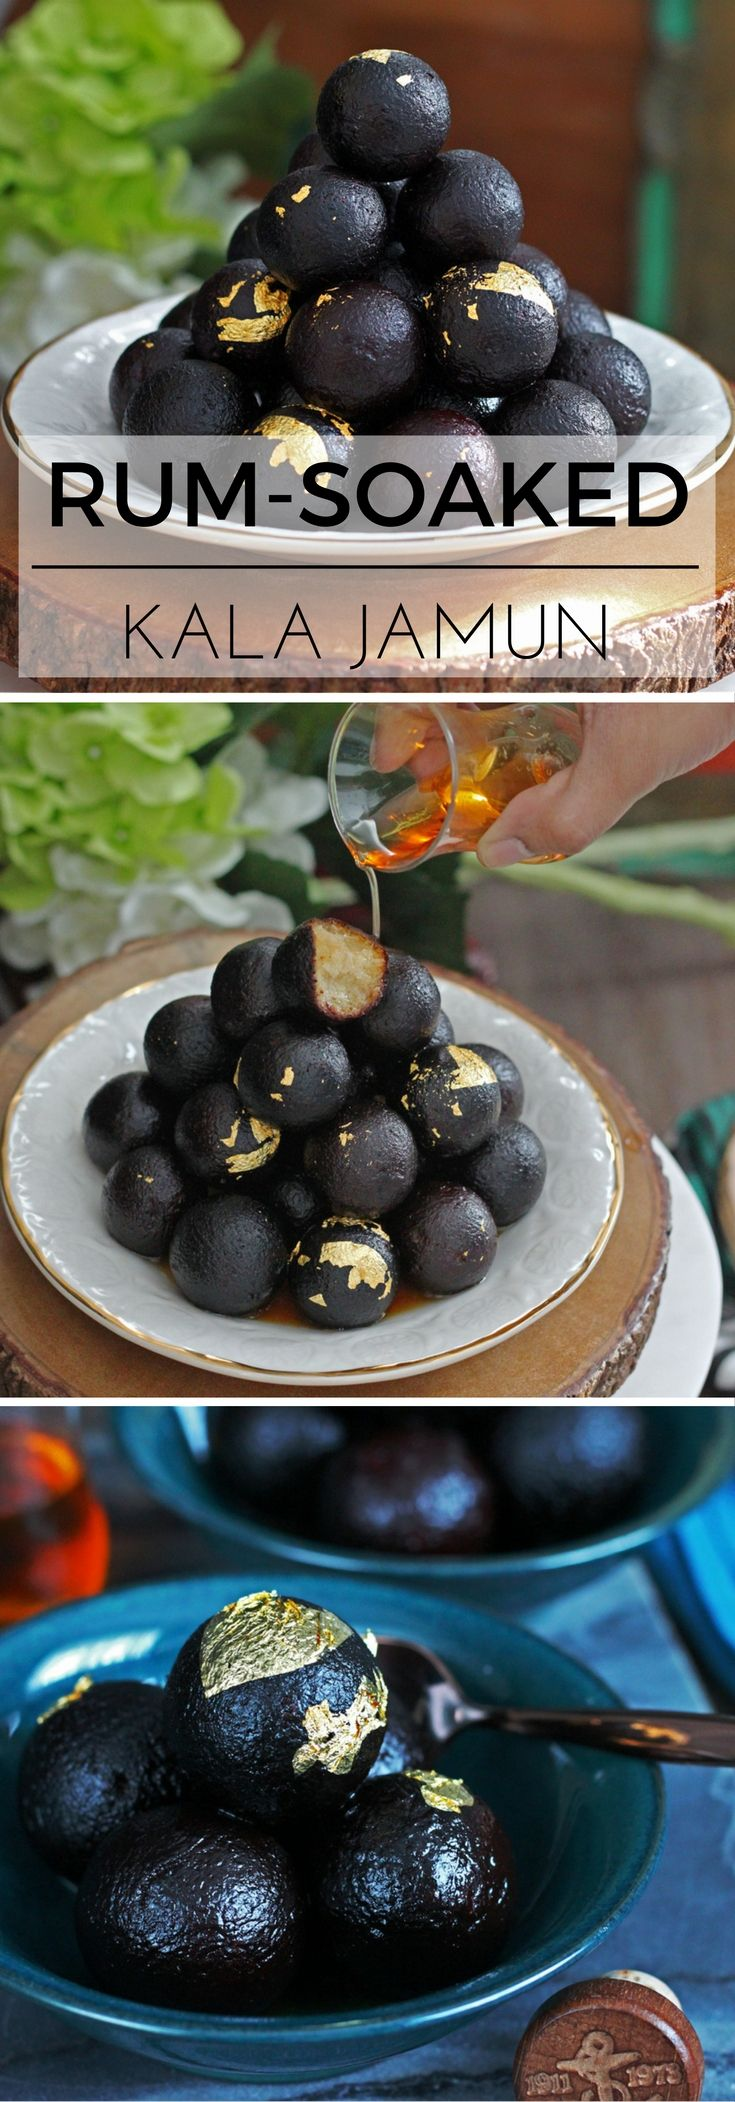 Rum-Soaked Kala Jamun (Cardamom and Rum Doughnuts) | K.O Rasoi